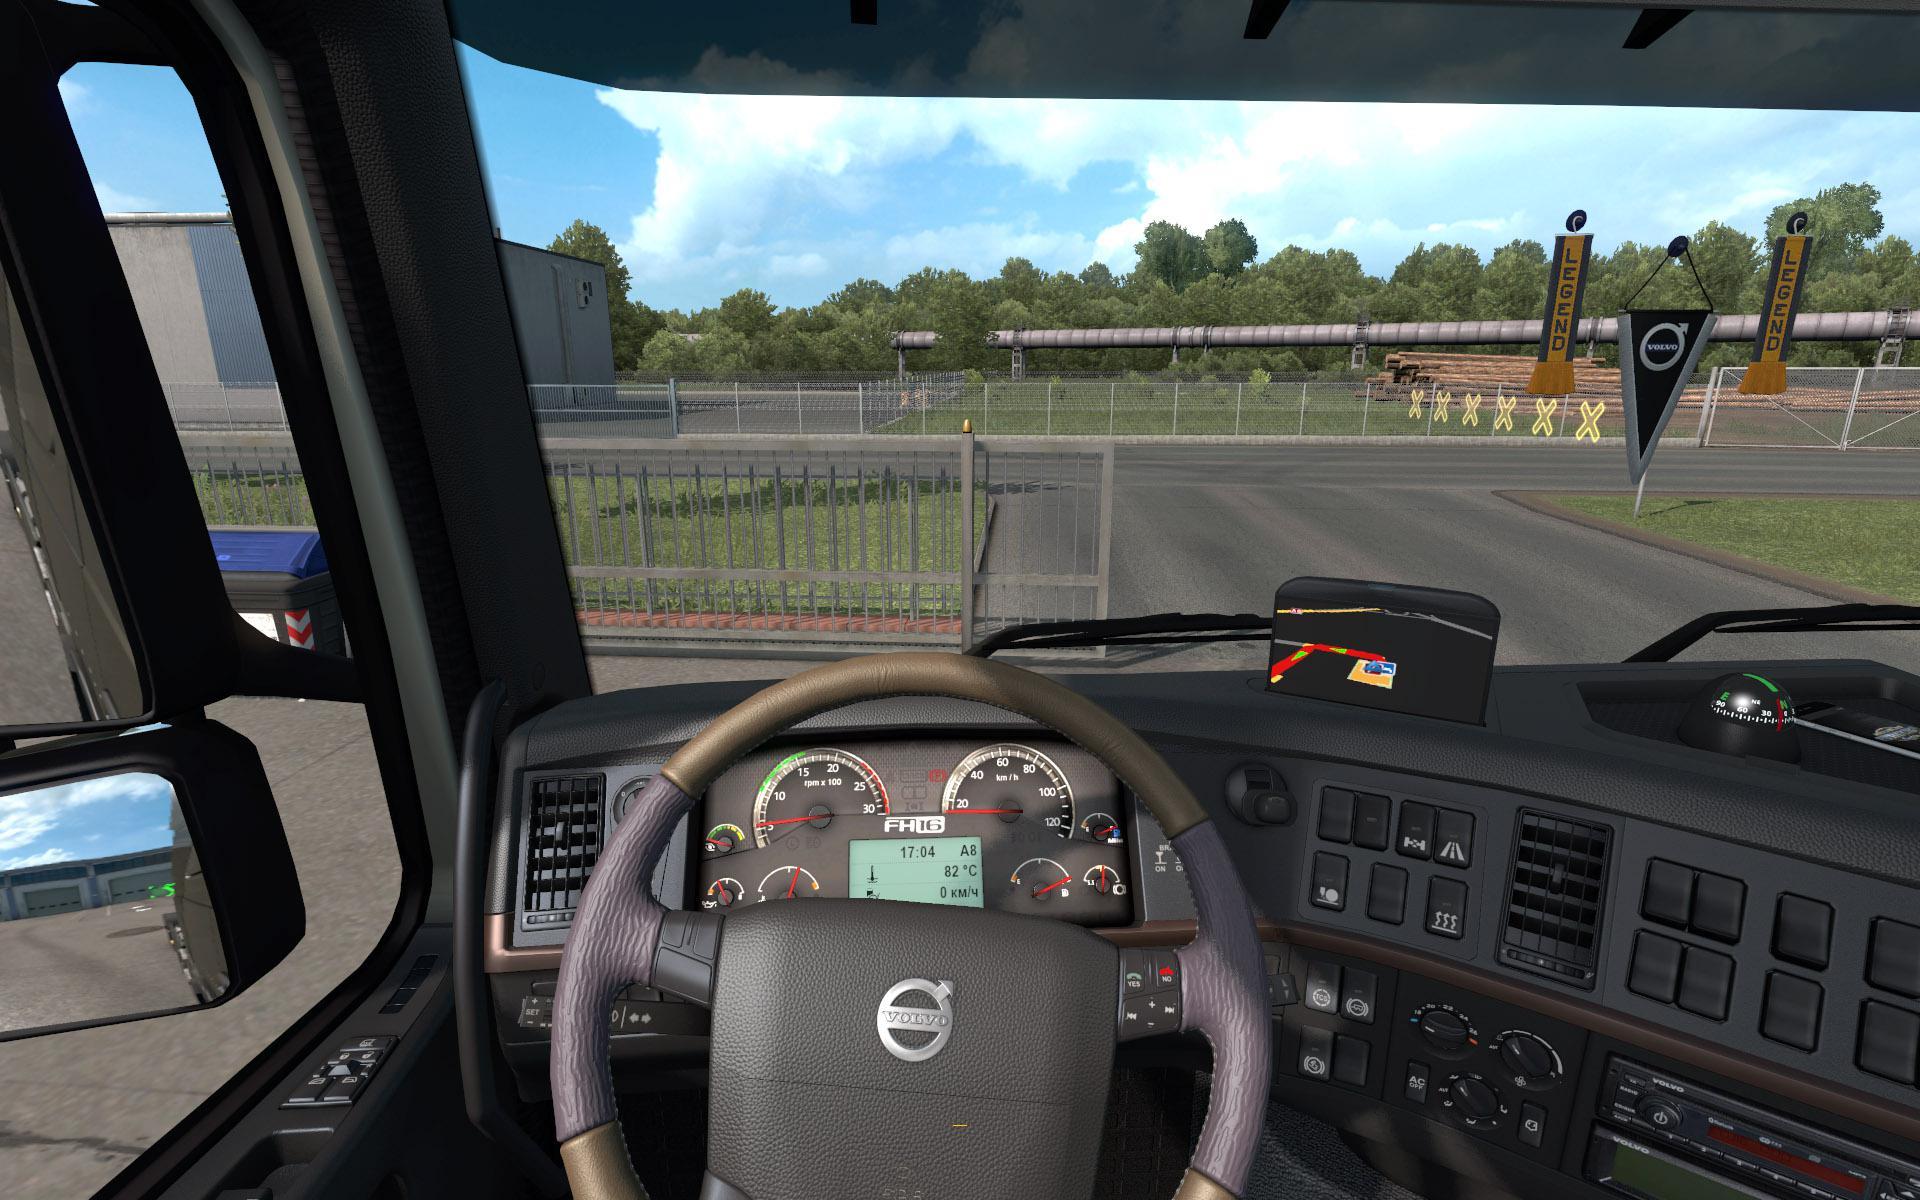 ETS2 - Volvo FH 2009 Interior (1.36.x)